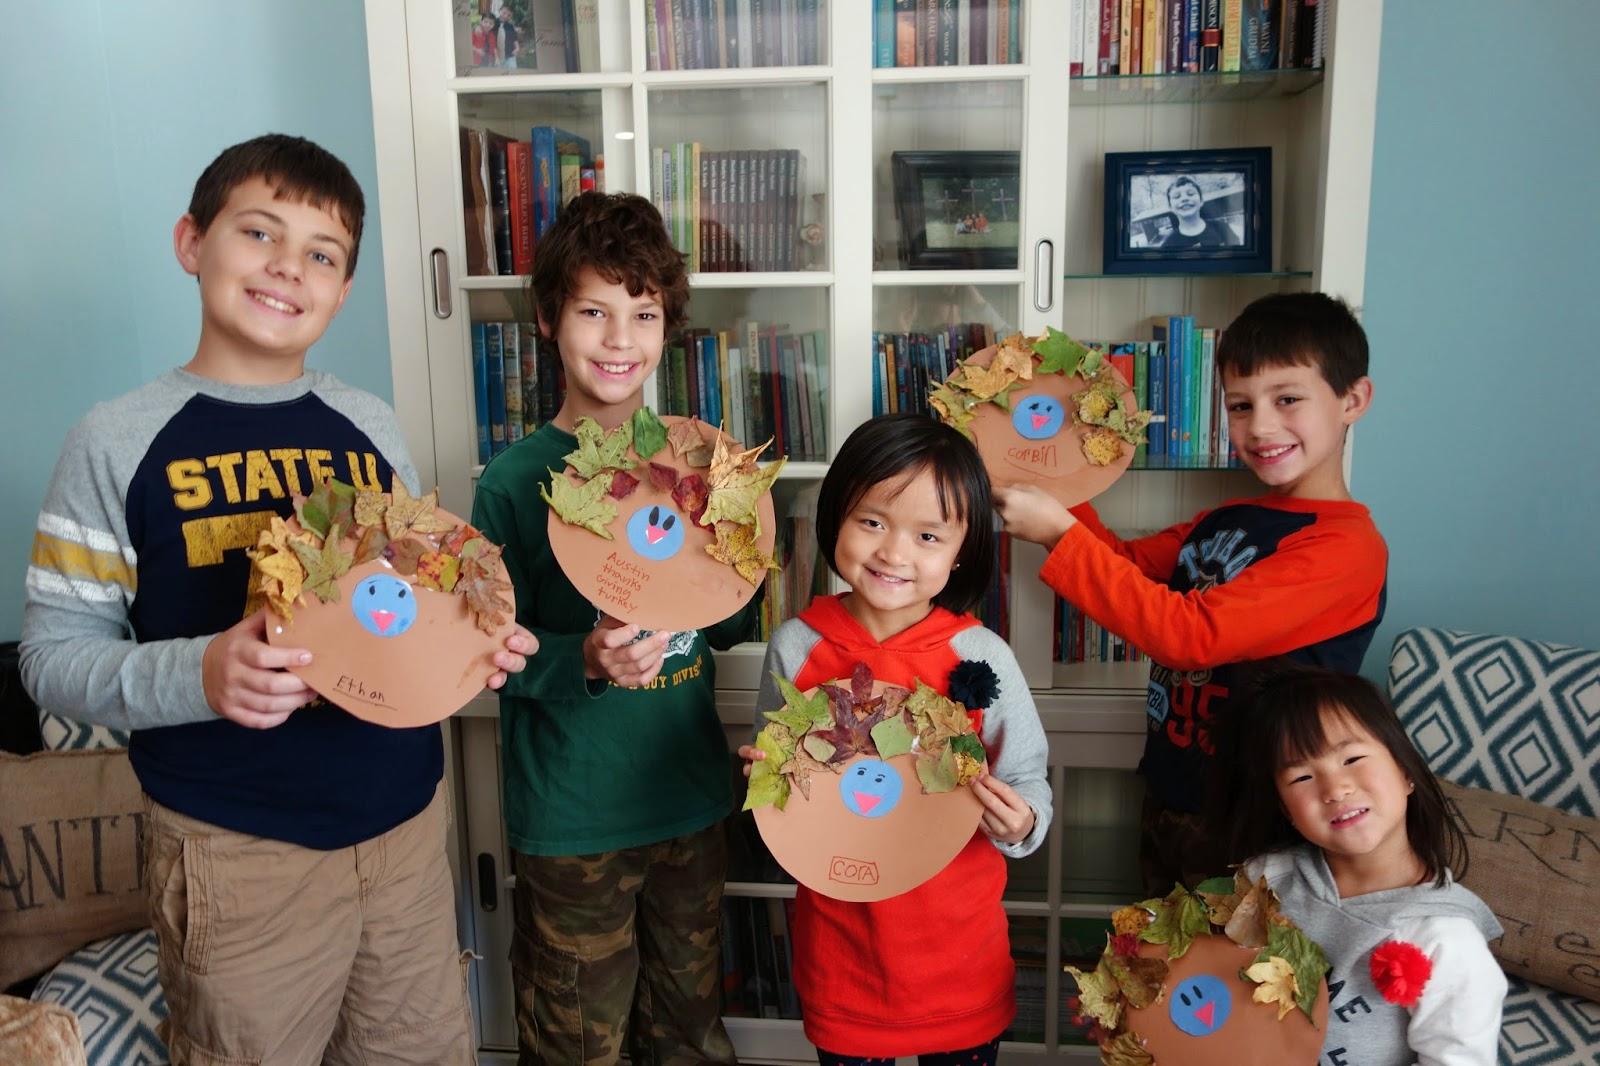 Firetrucks Amp Fairytales A Turkey For Thanksgiving